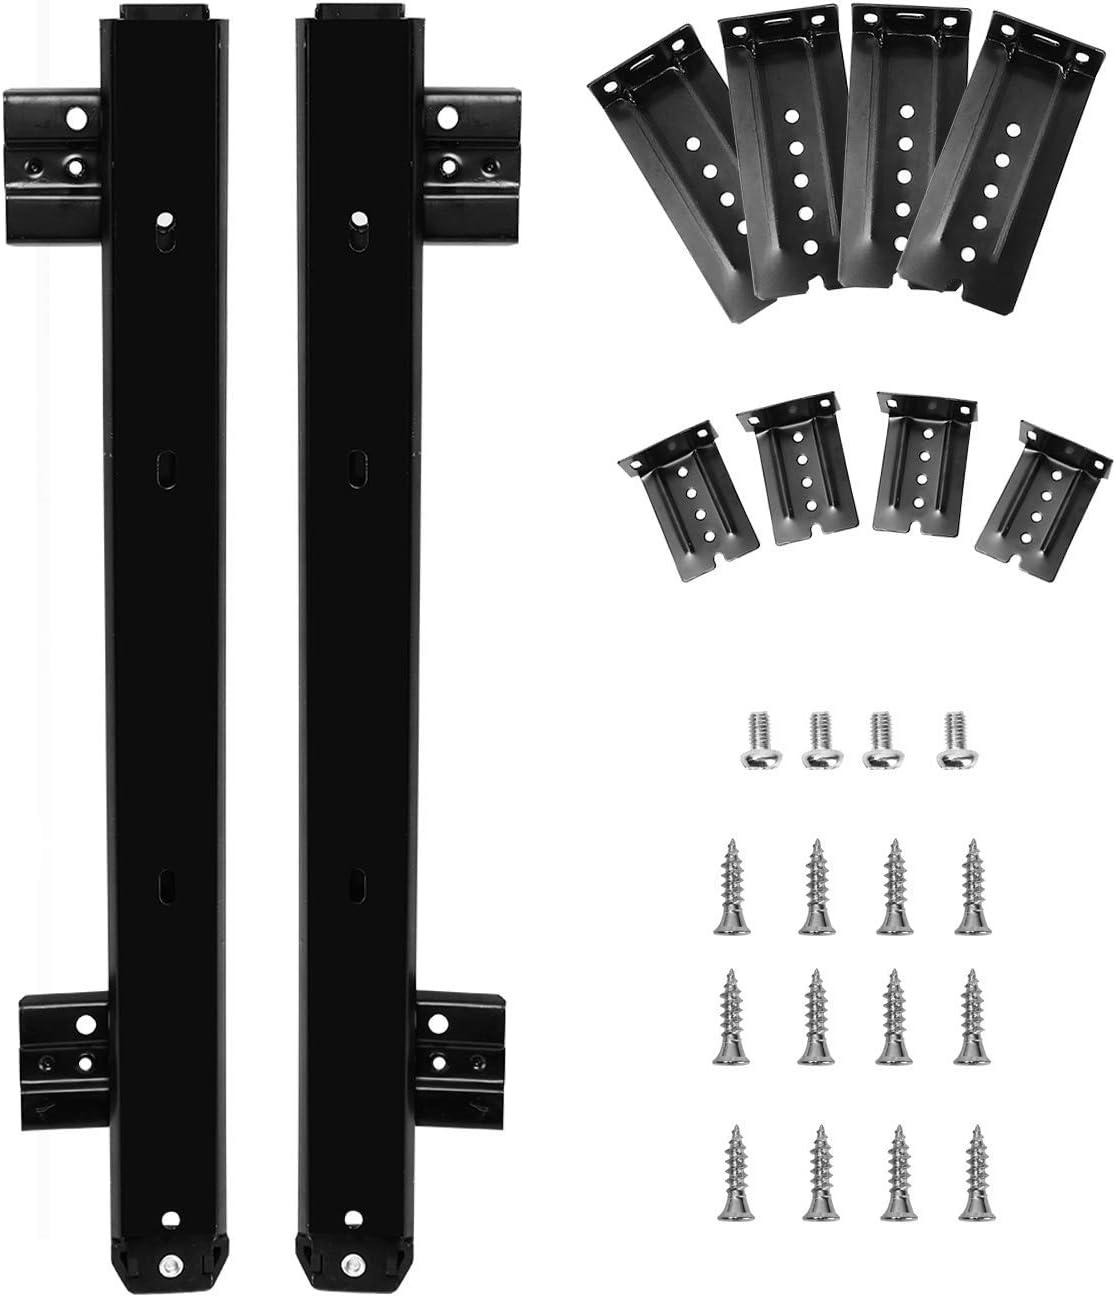 Keyboard Slide, KINJOEK 14 Inch 2 PCS Heavy Duty Ball Bearing Slides, Computer Drawer Tray Accessories, Cabinet Furniture Rails Rack with Adjustable Height Bracket and Screws, Black